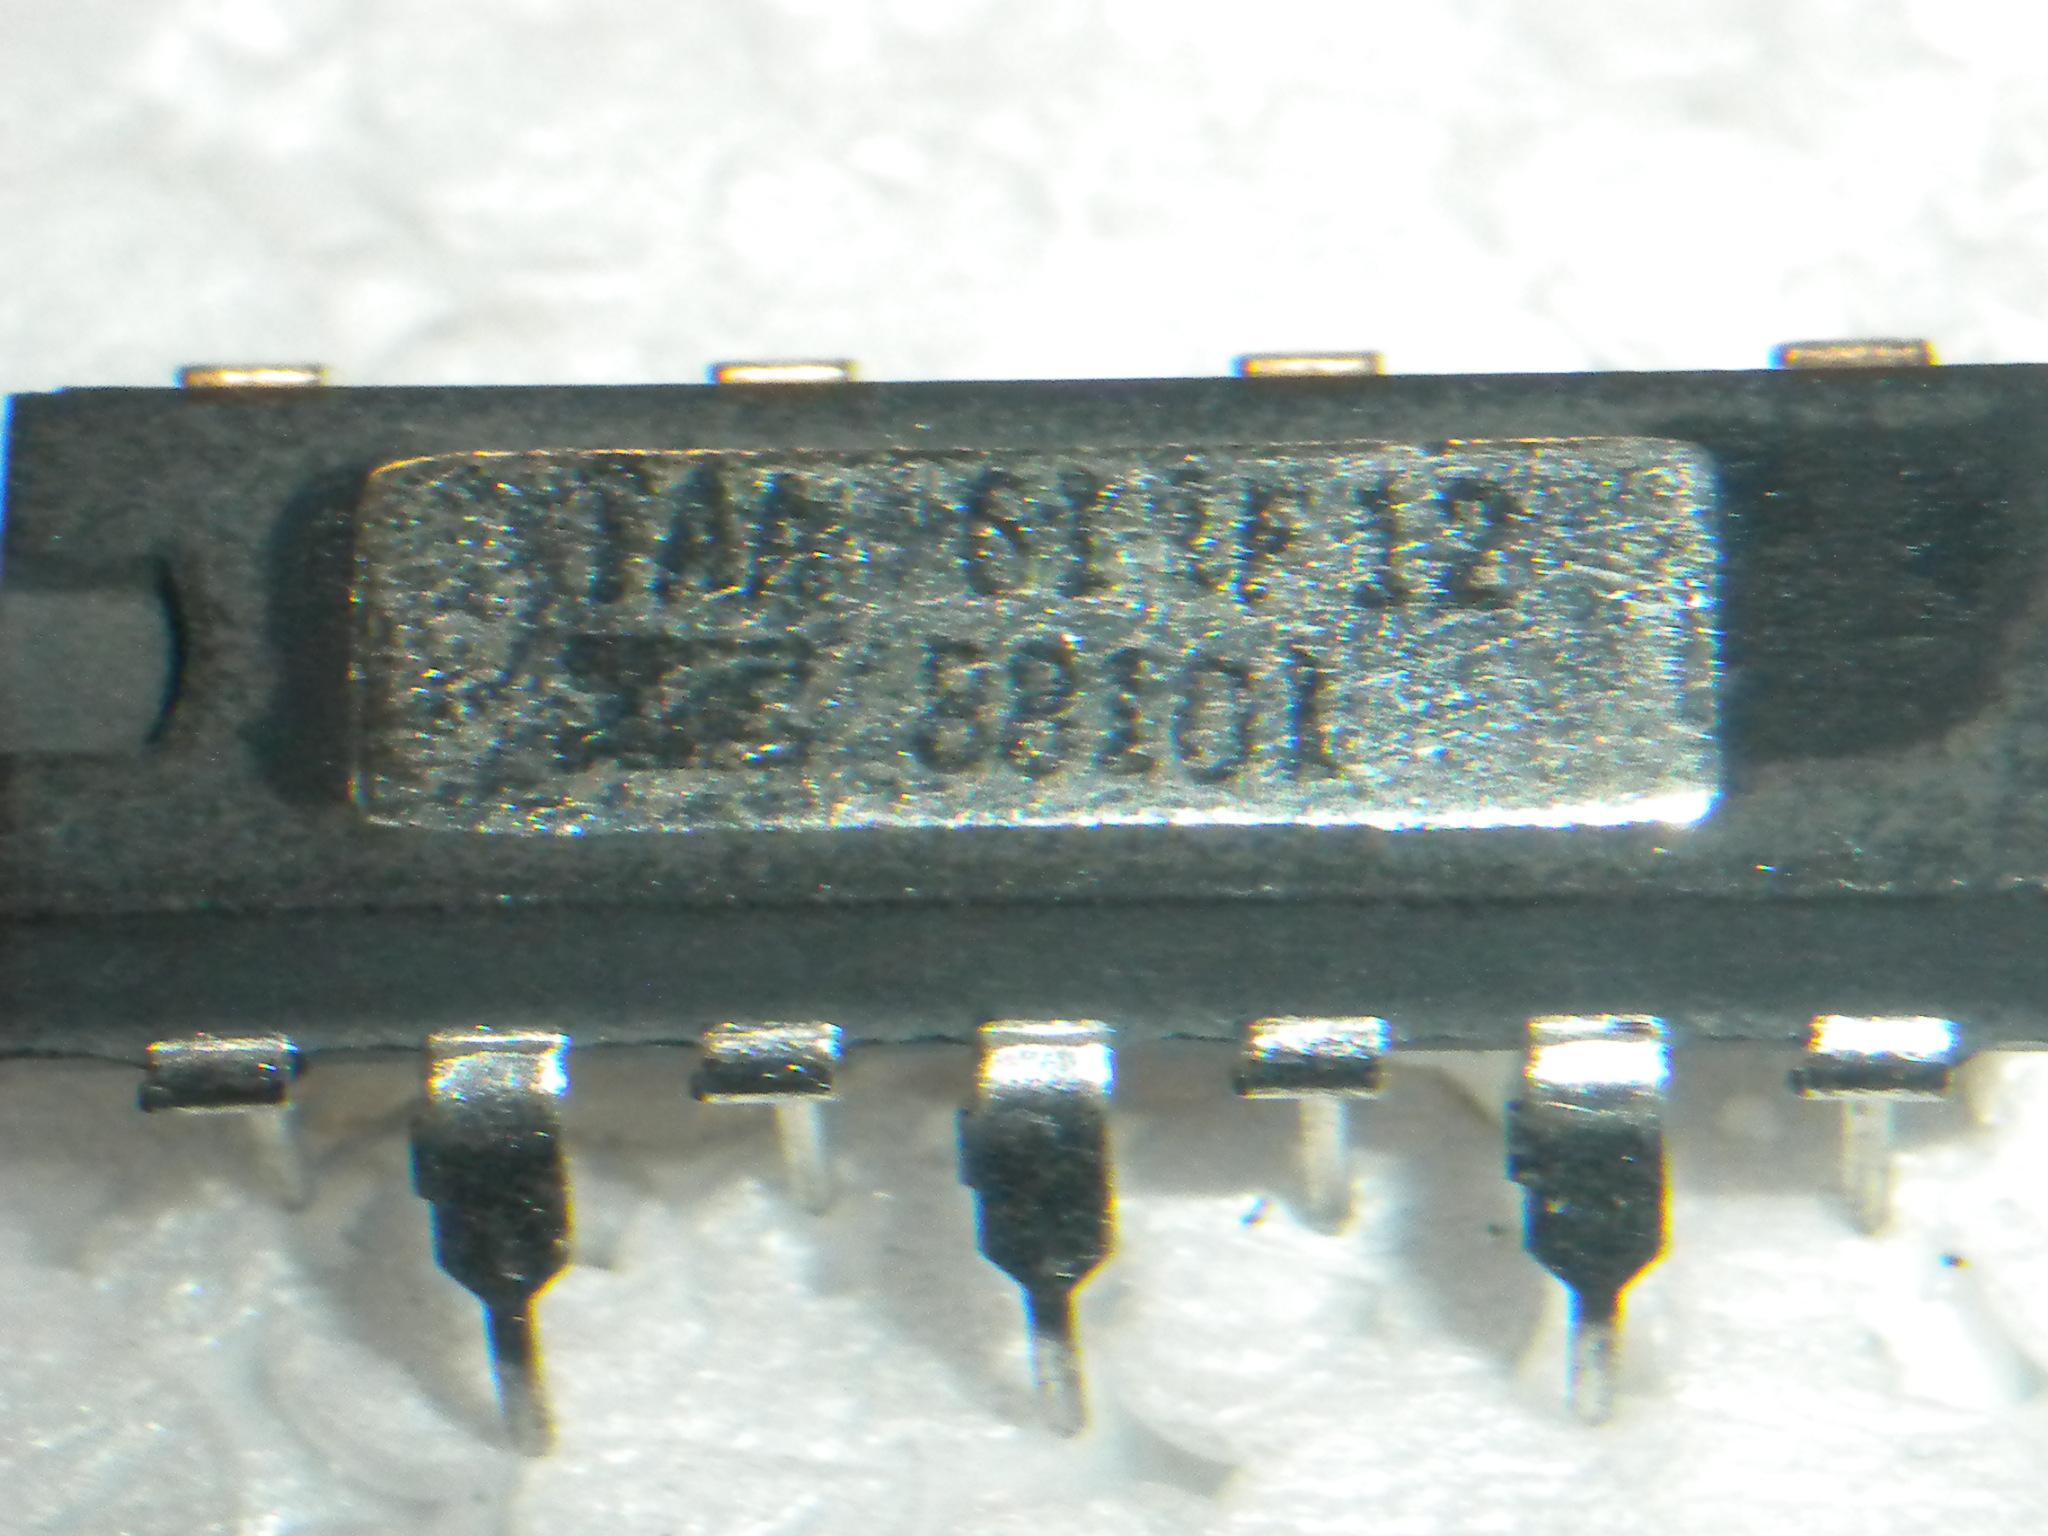 Taa611b12 circuito integrato